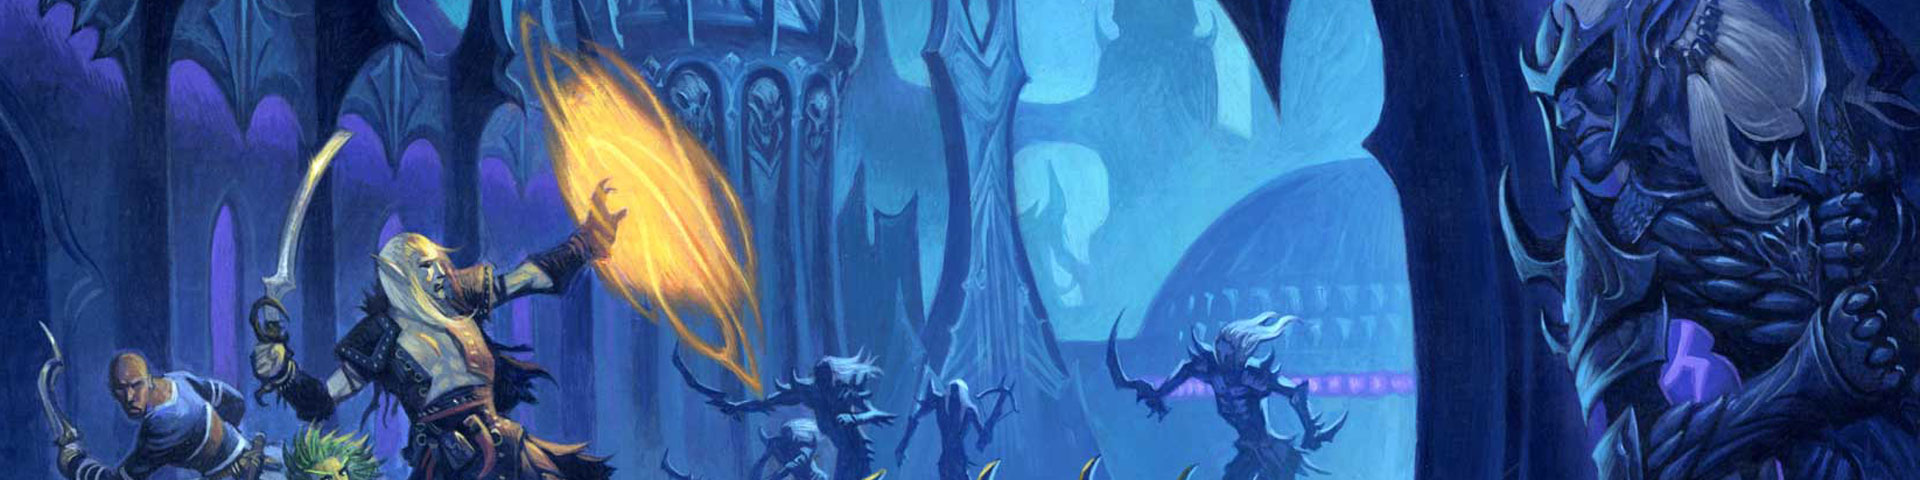 Heroes confront dark elves in a lost elven city.